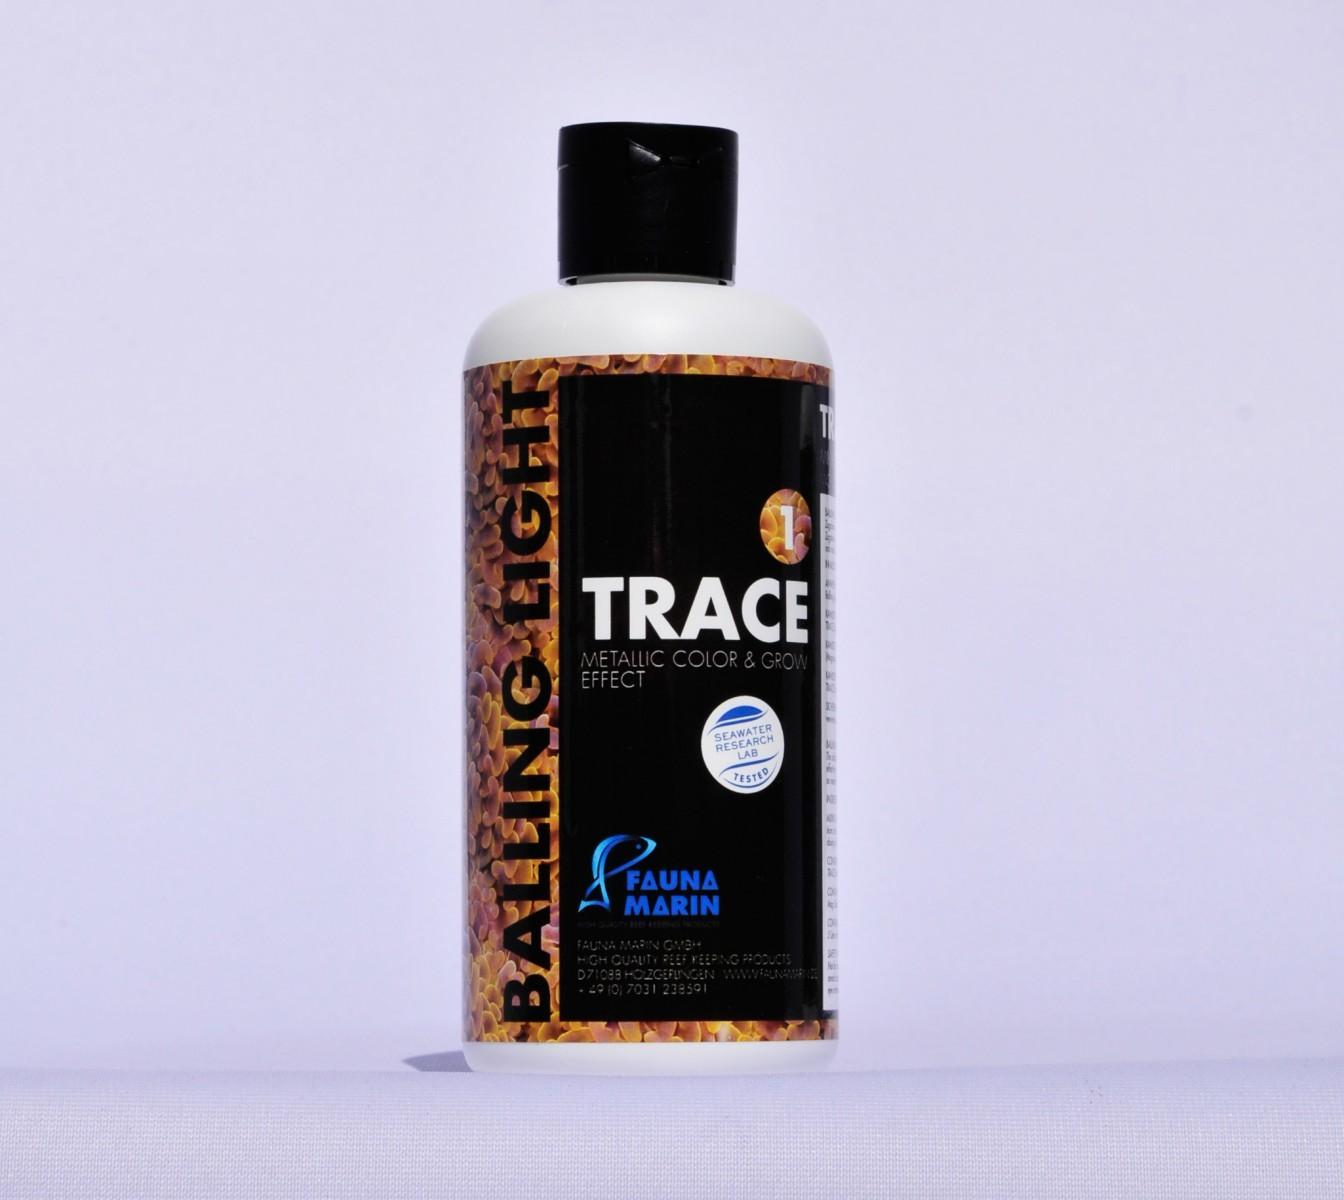 Balling Trace 1 Metallic Color & Grow Effect